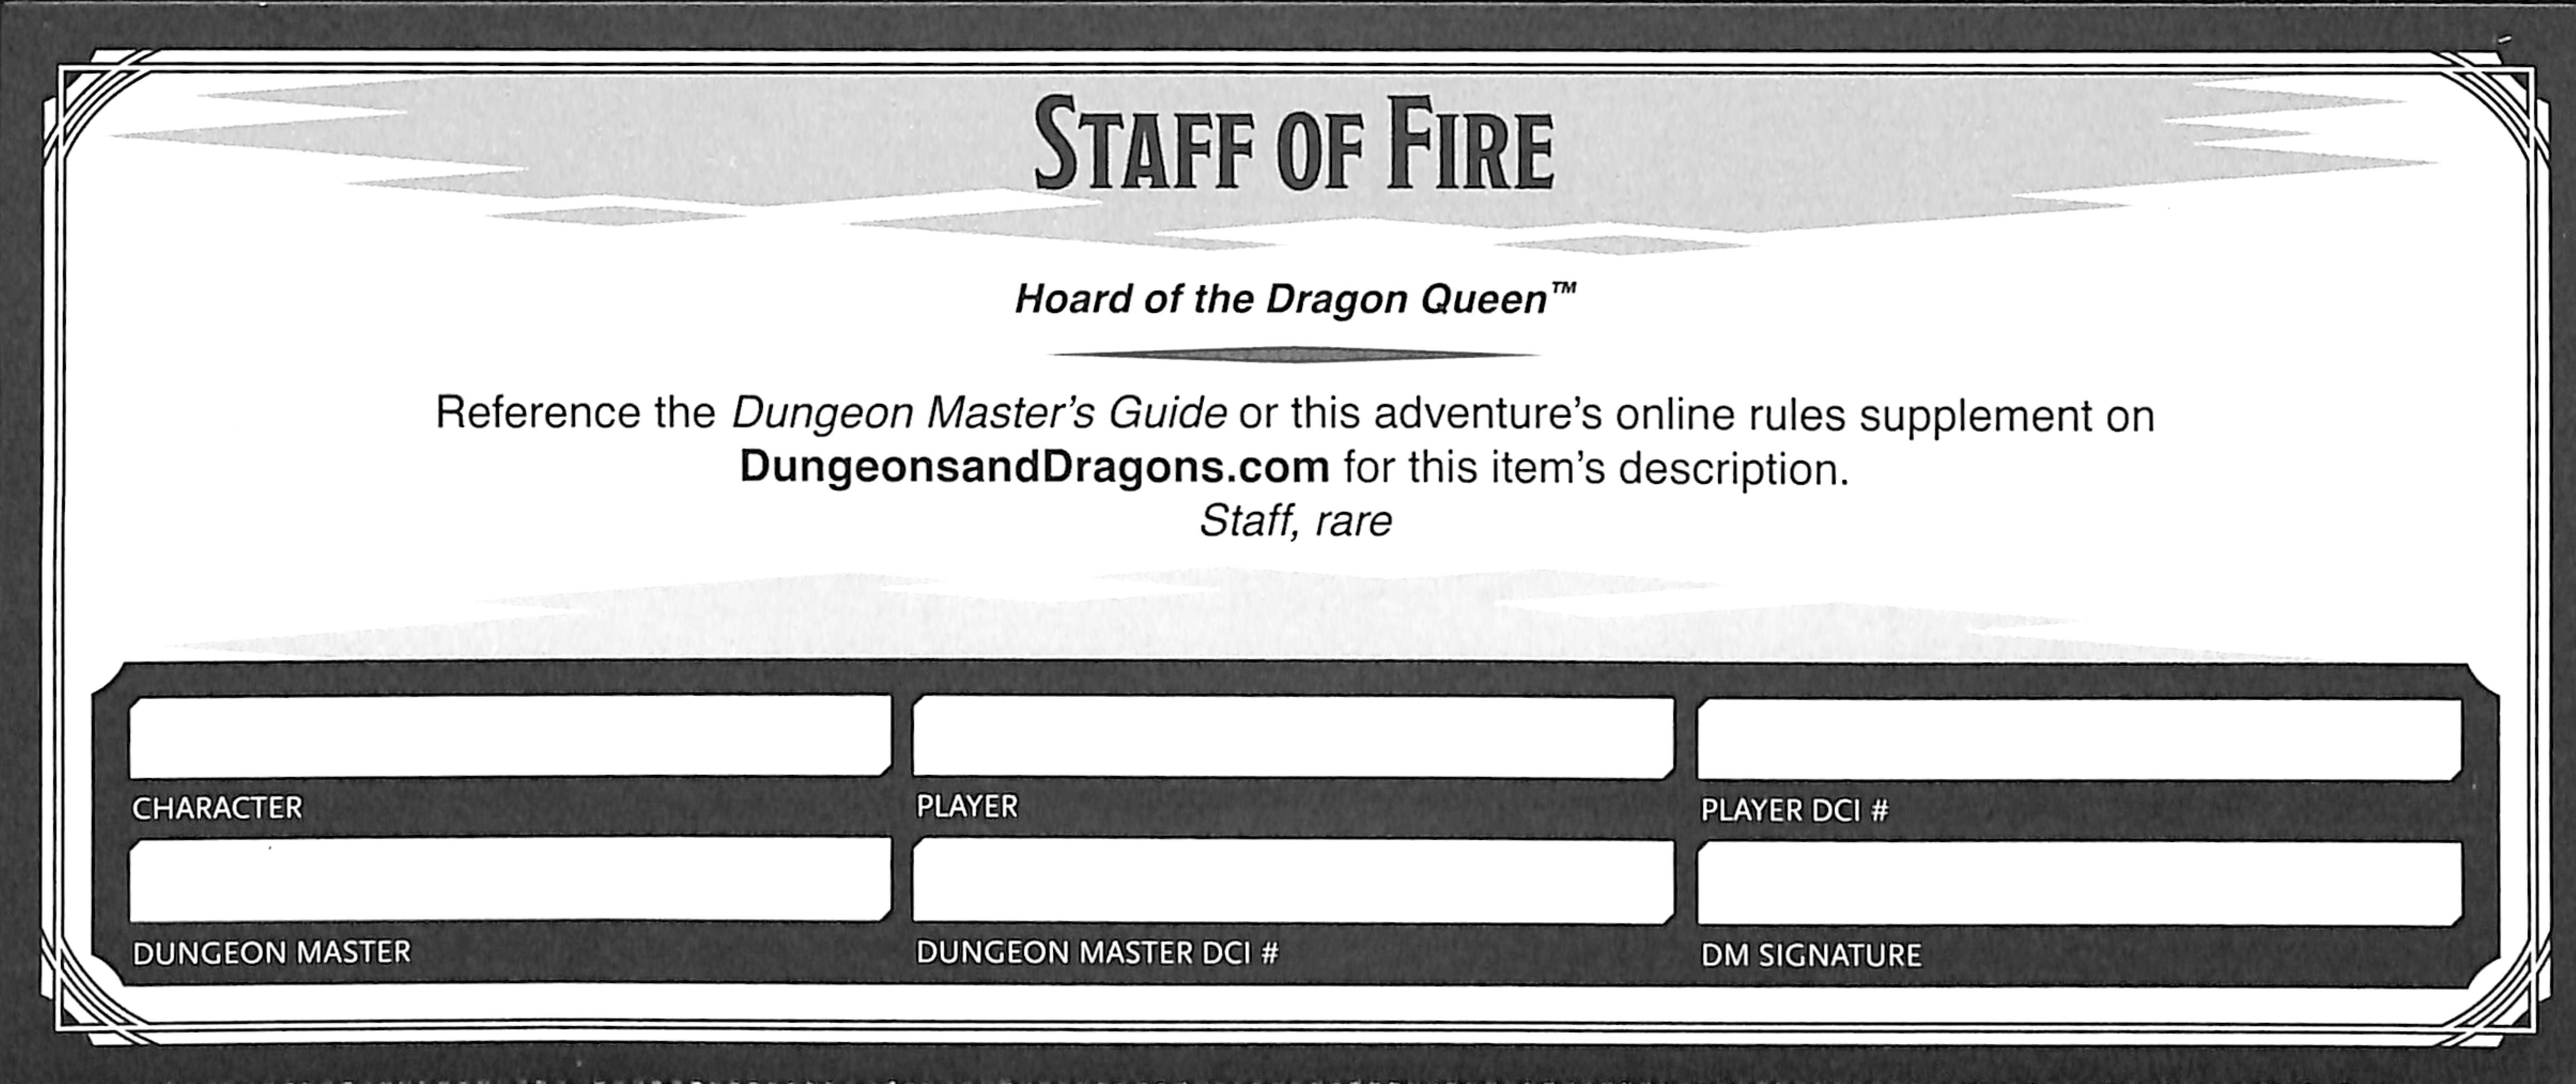 Staff of Fire Certificate